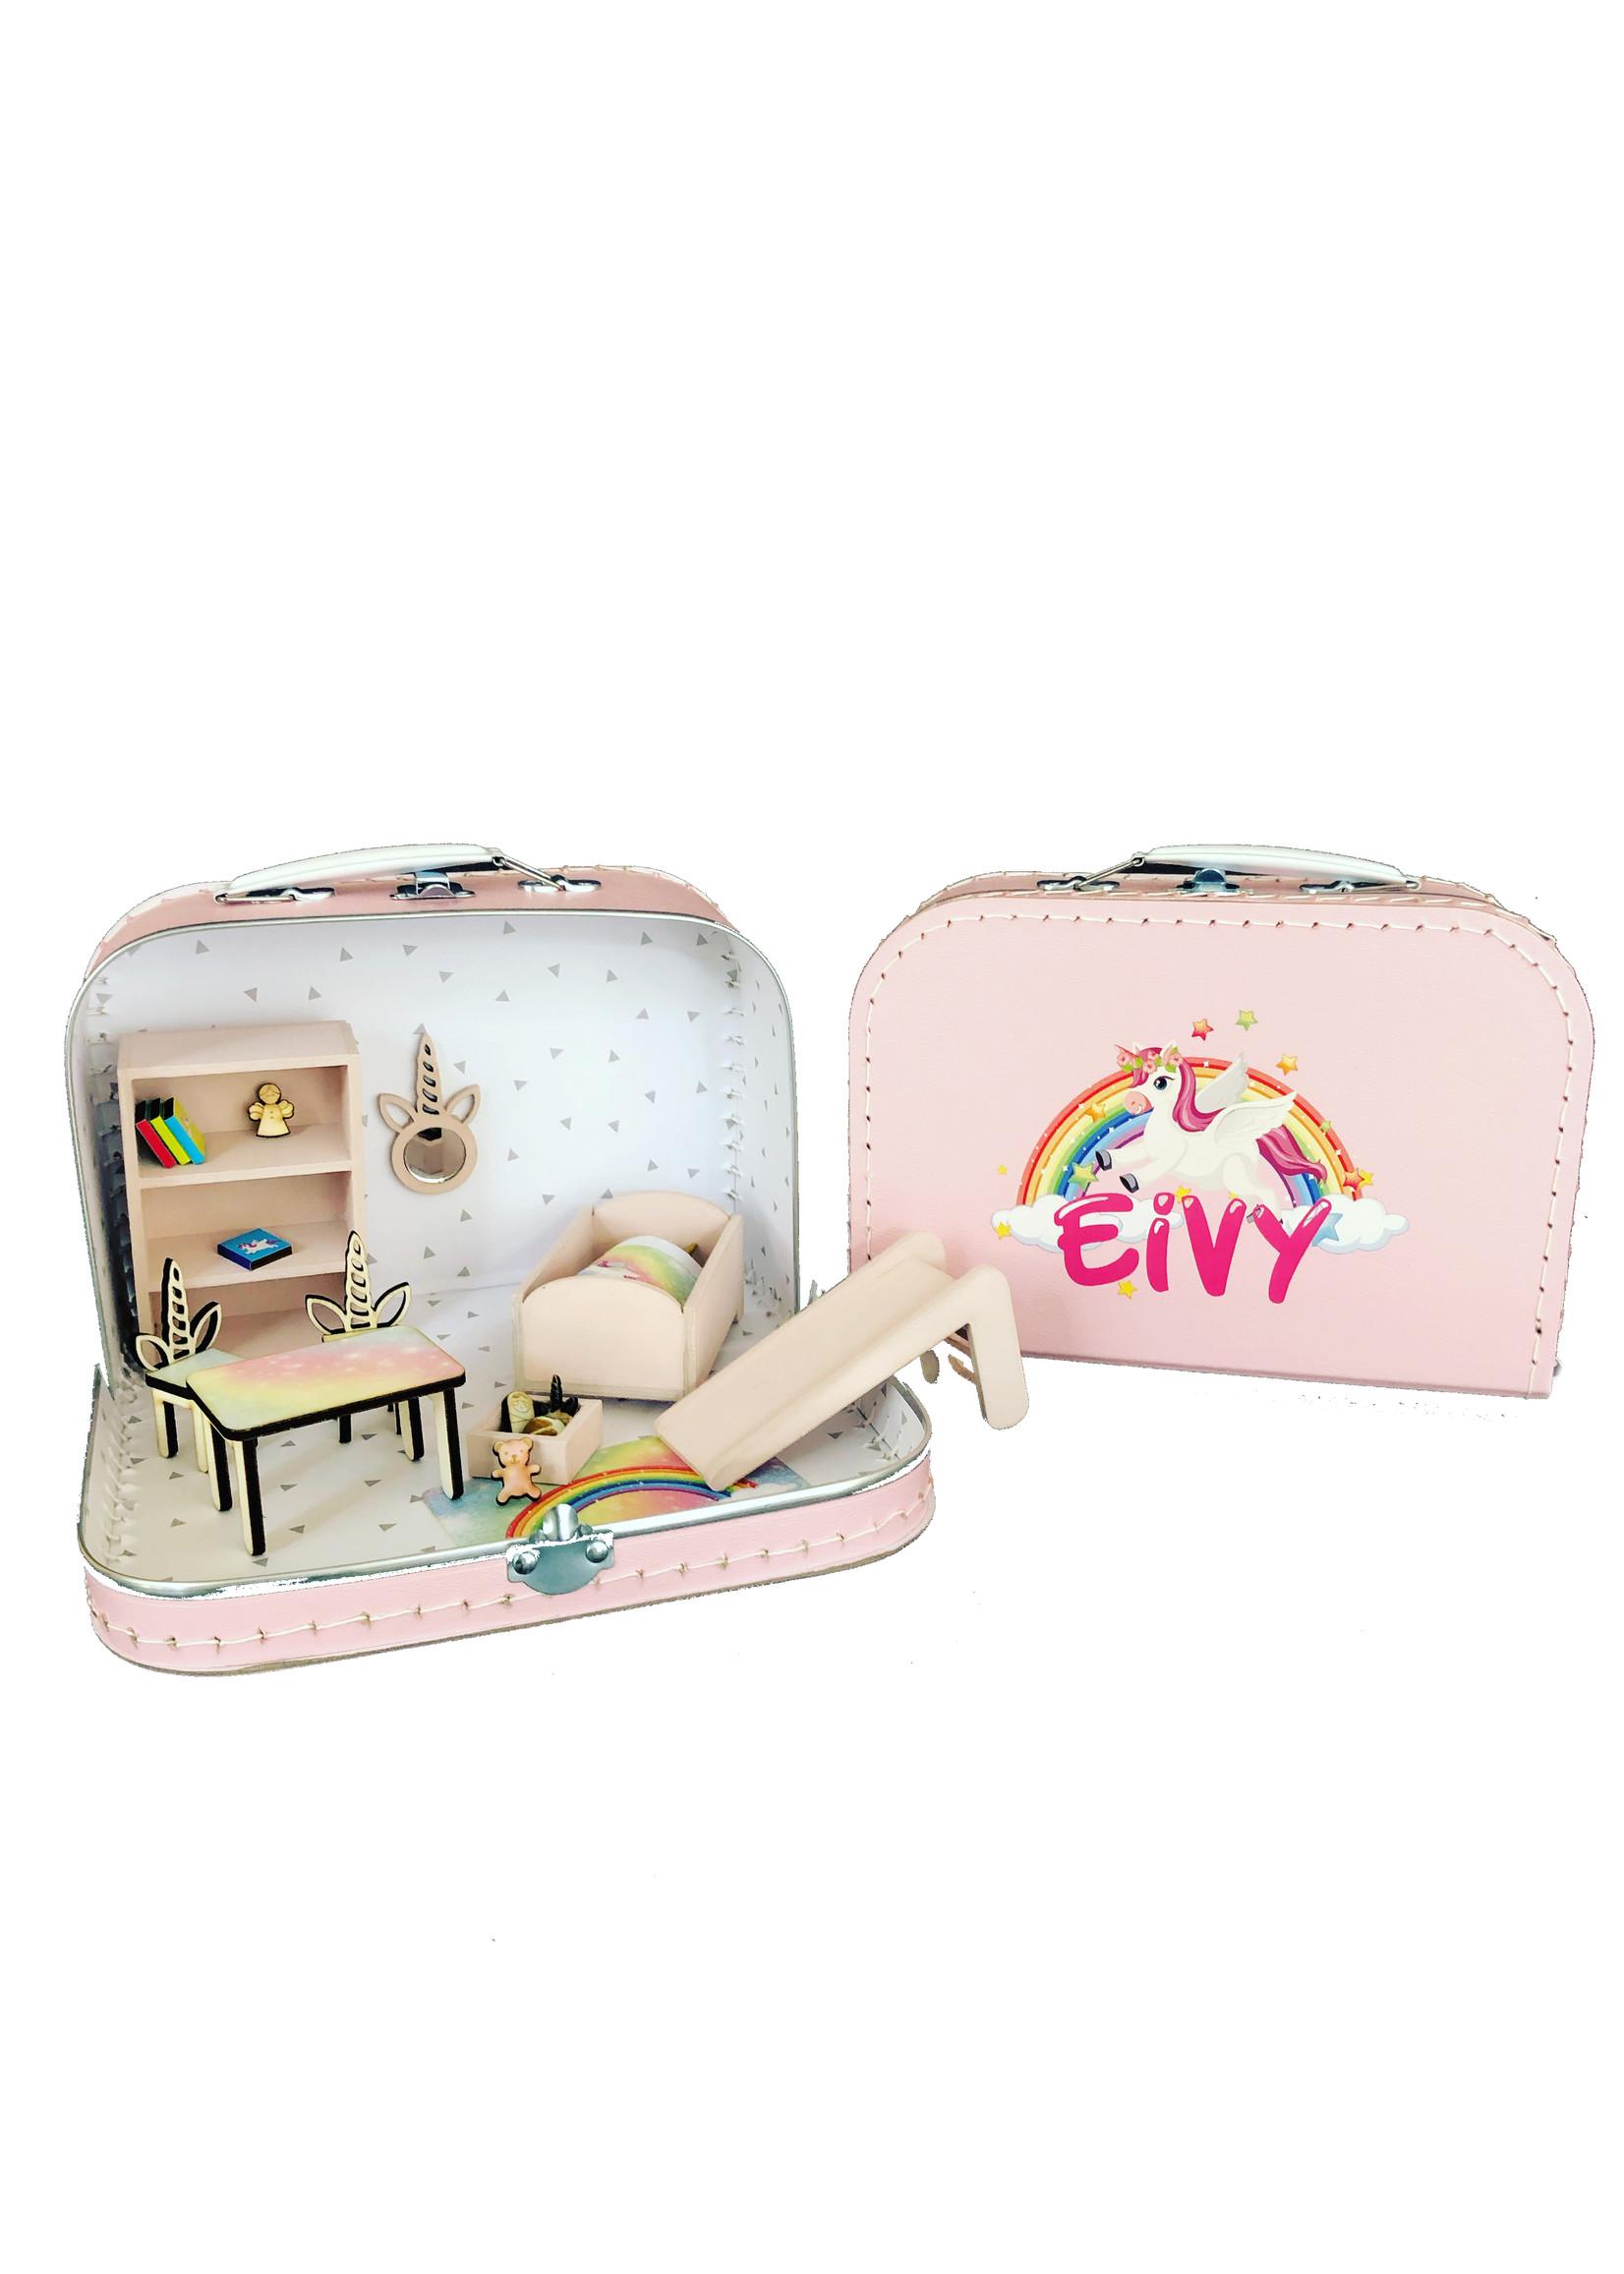 Kinder koffer poppenhuis unicorn met naam